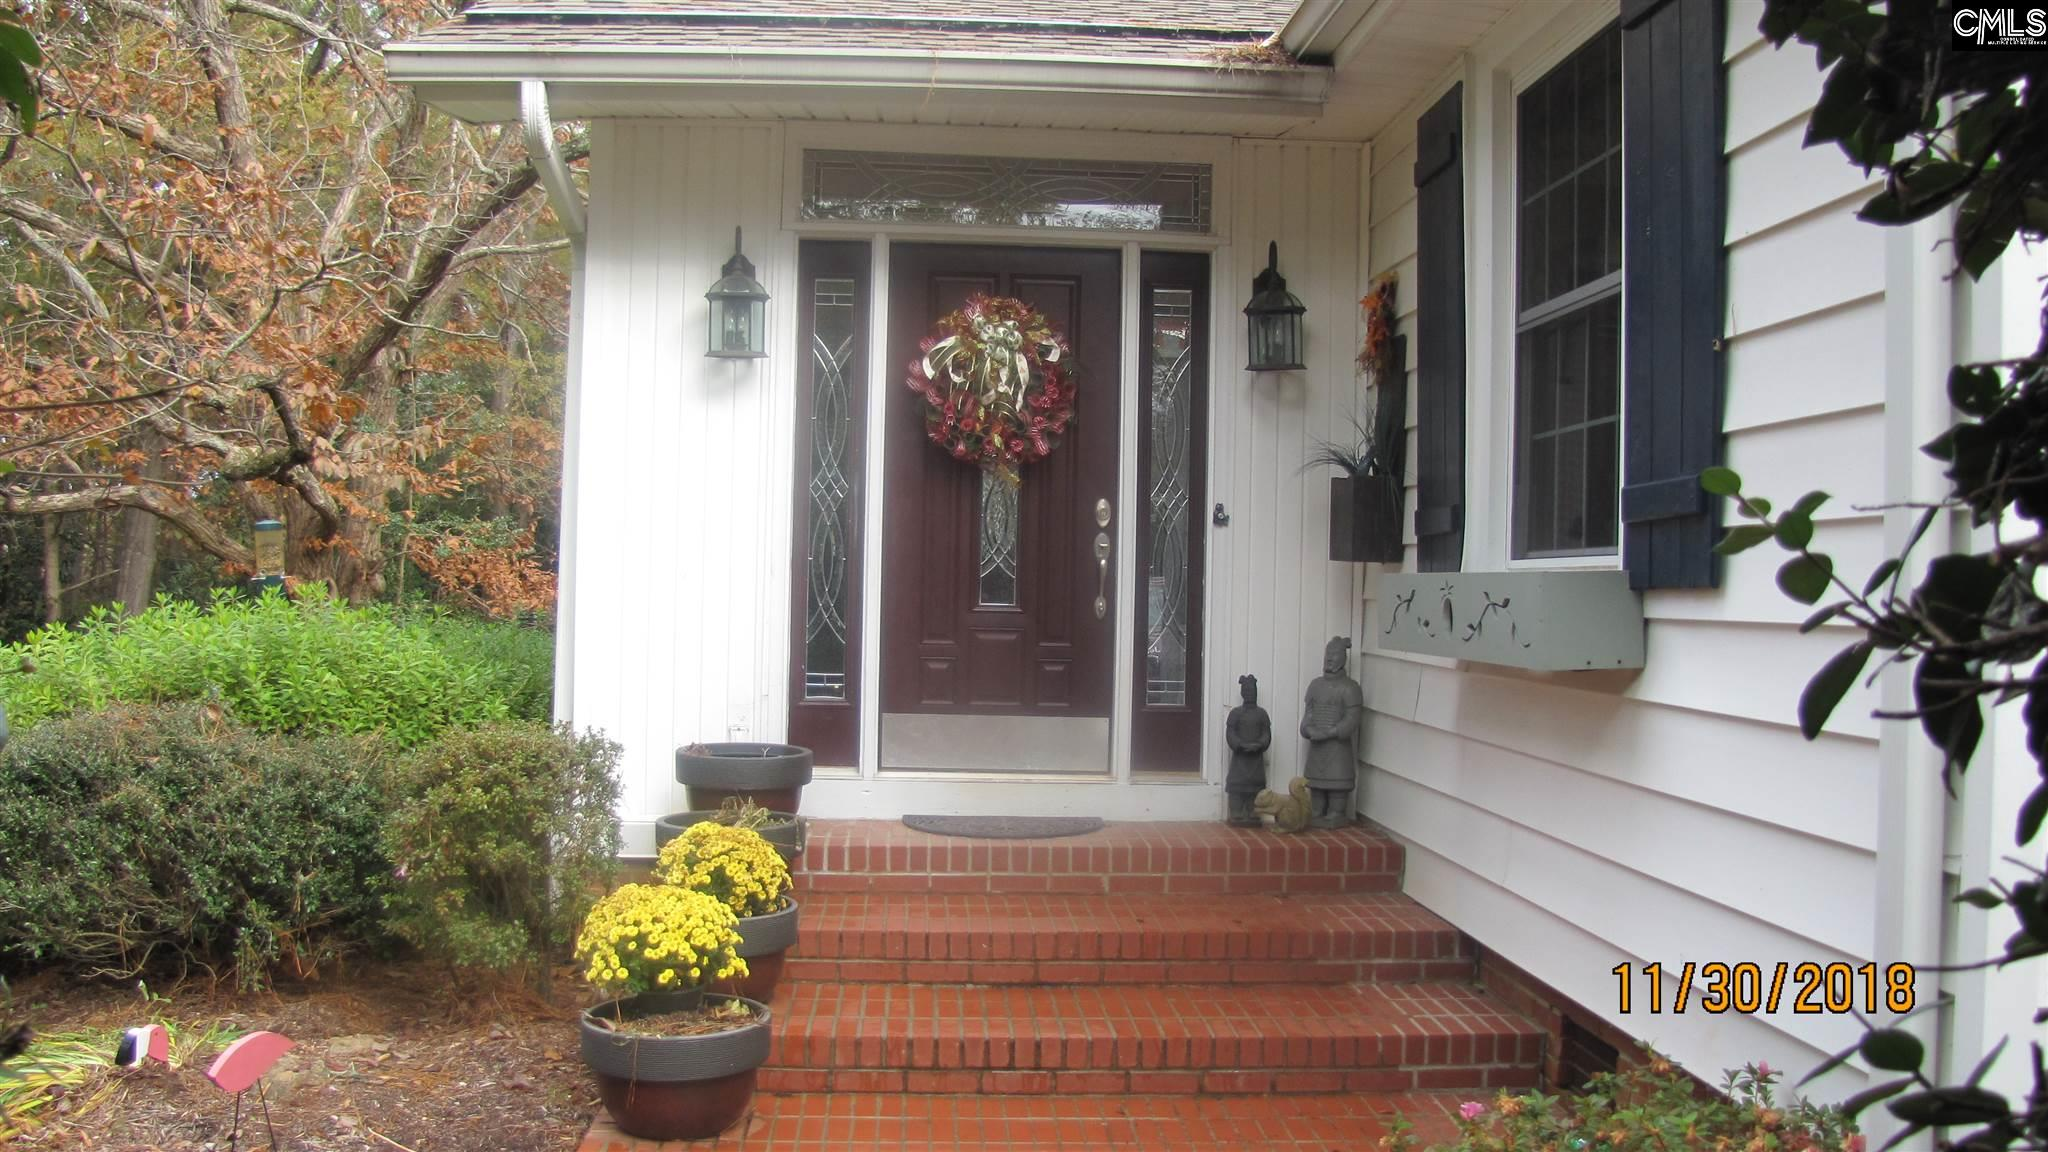 108 W High Winnsboro, SC 29180